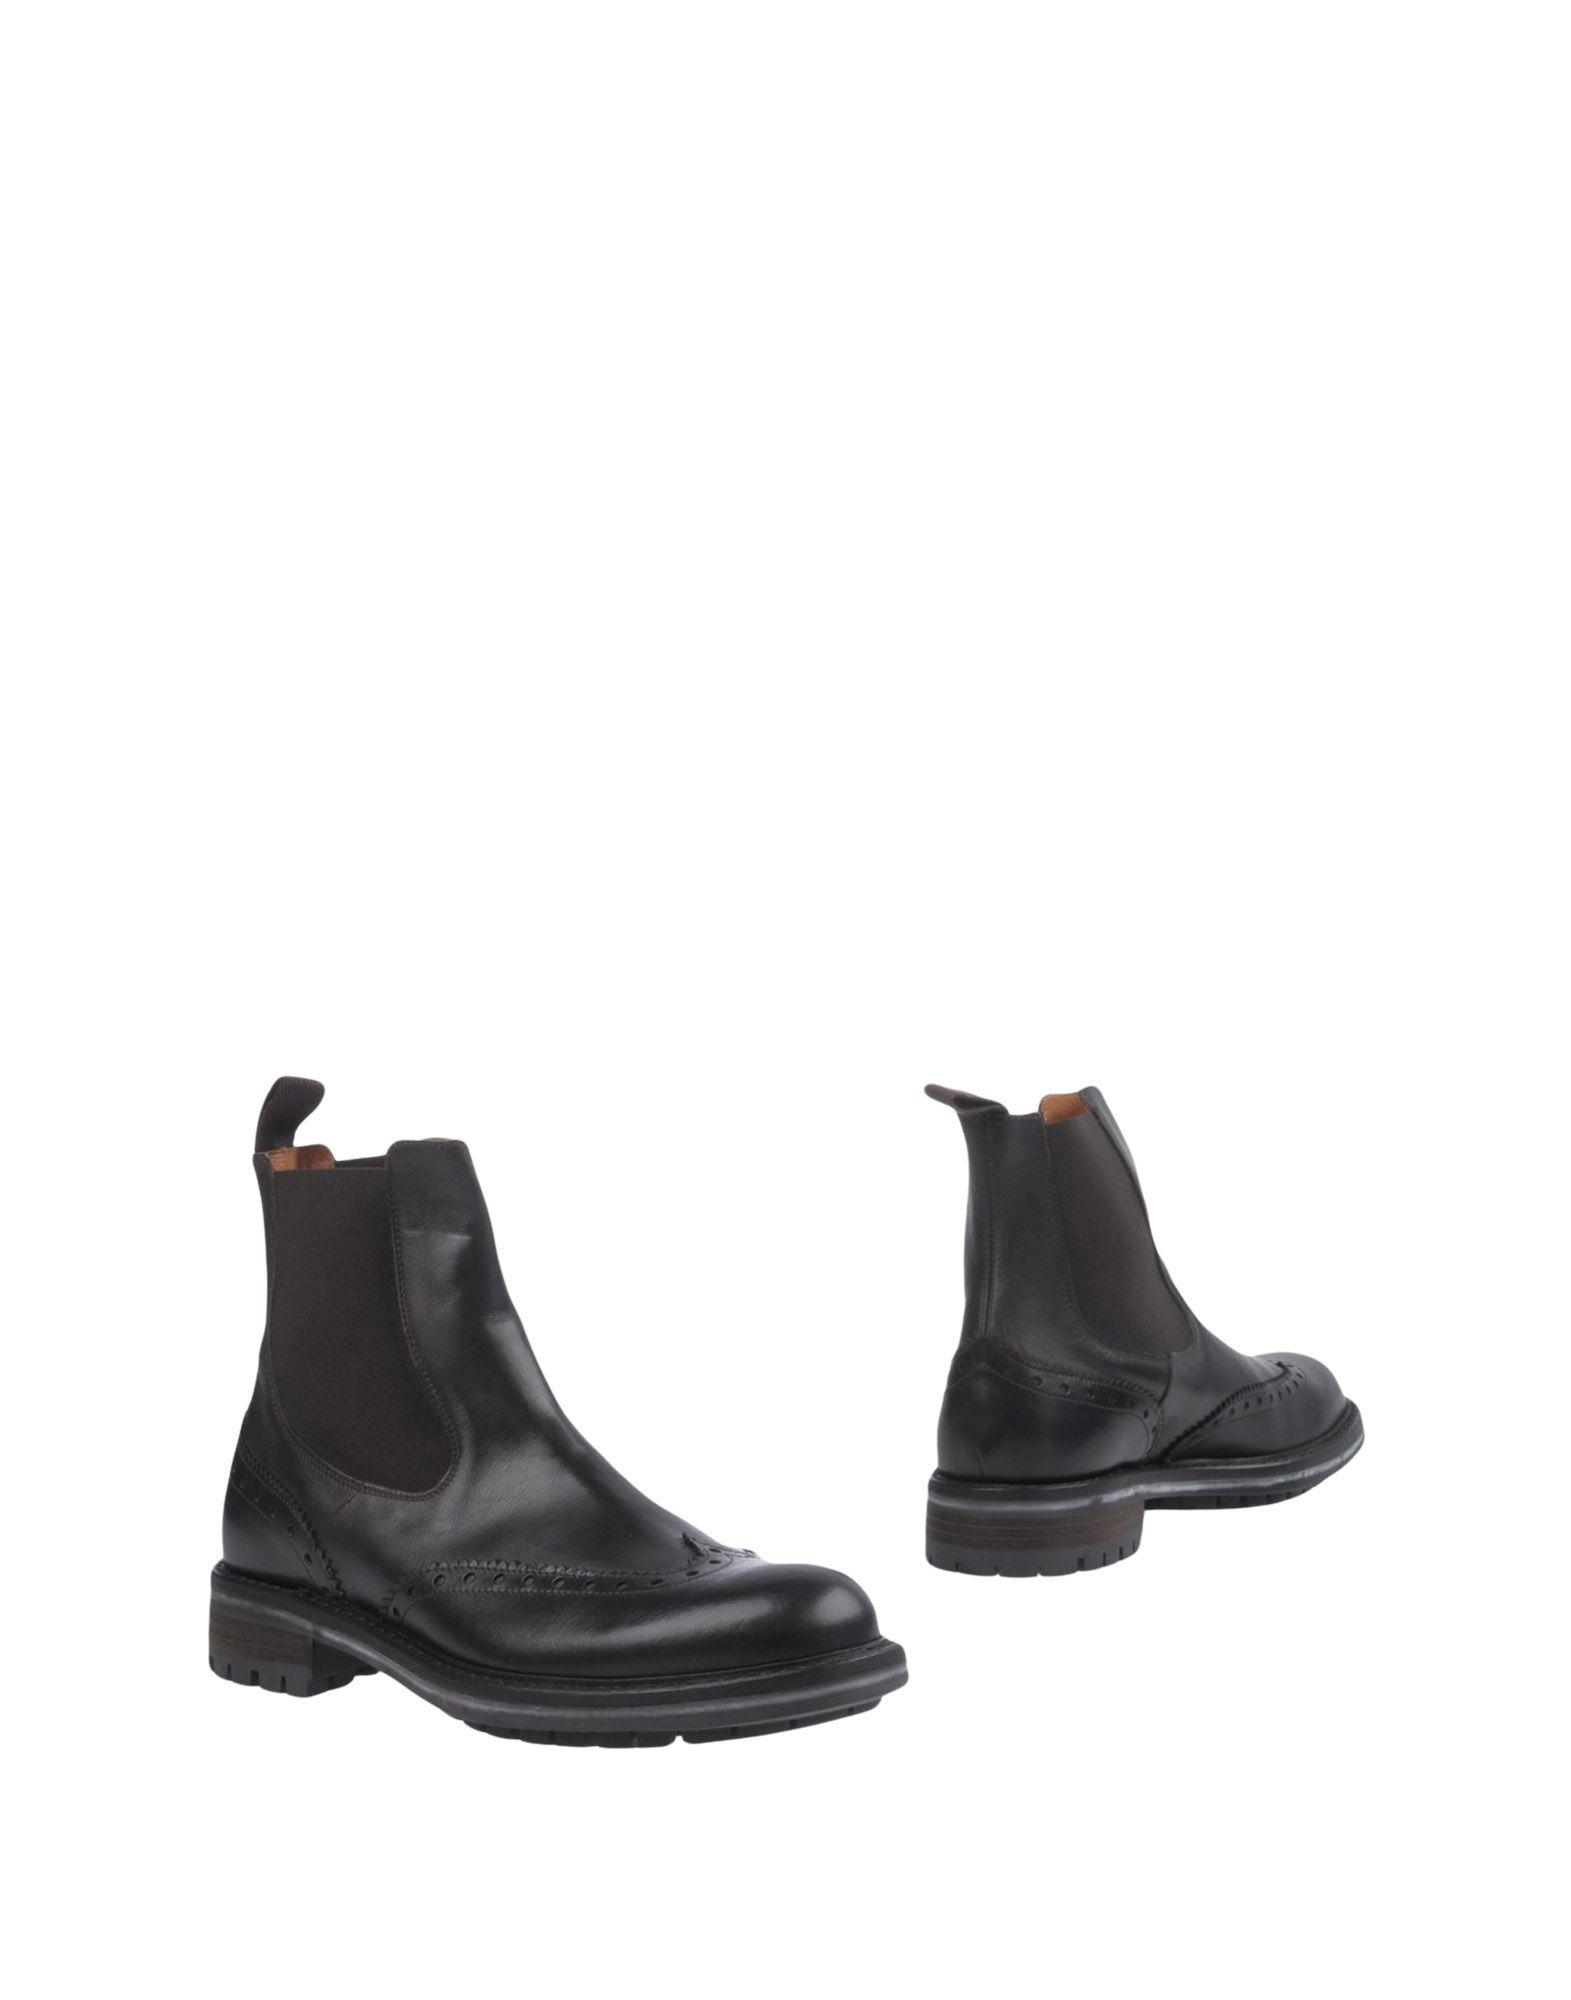 SEBOY'S Полусапоги и высокие ботинки magazzini del sale полусапоги и высокие ботинки